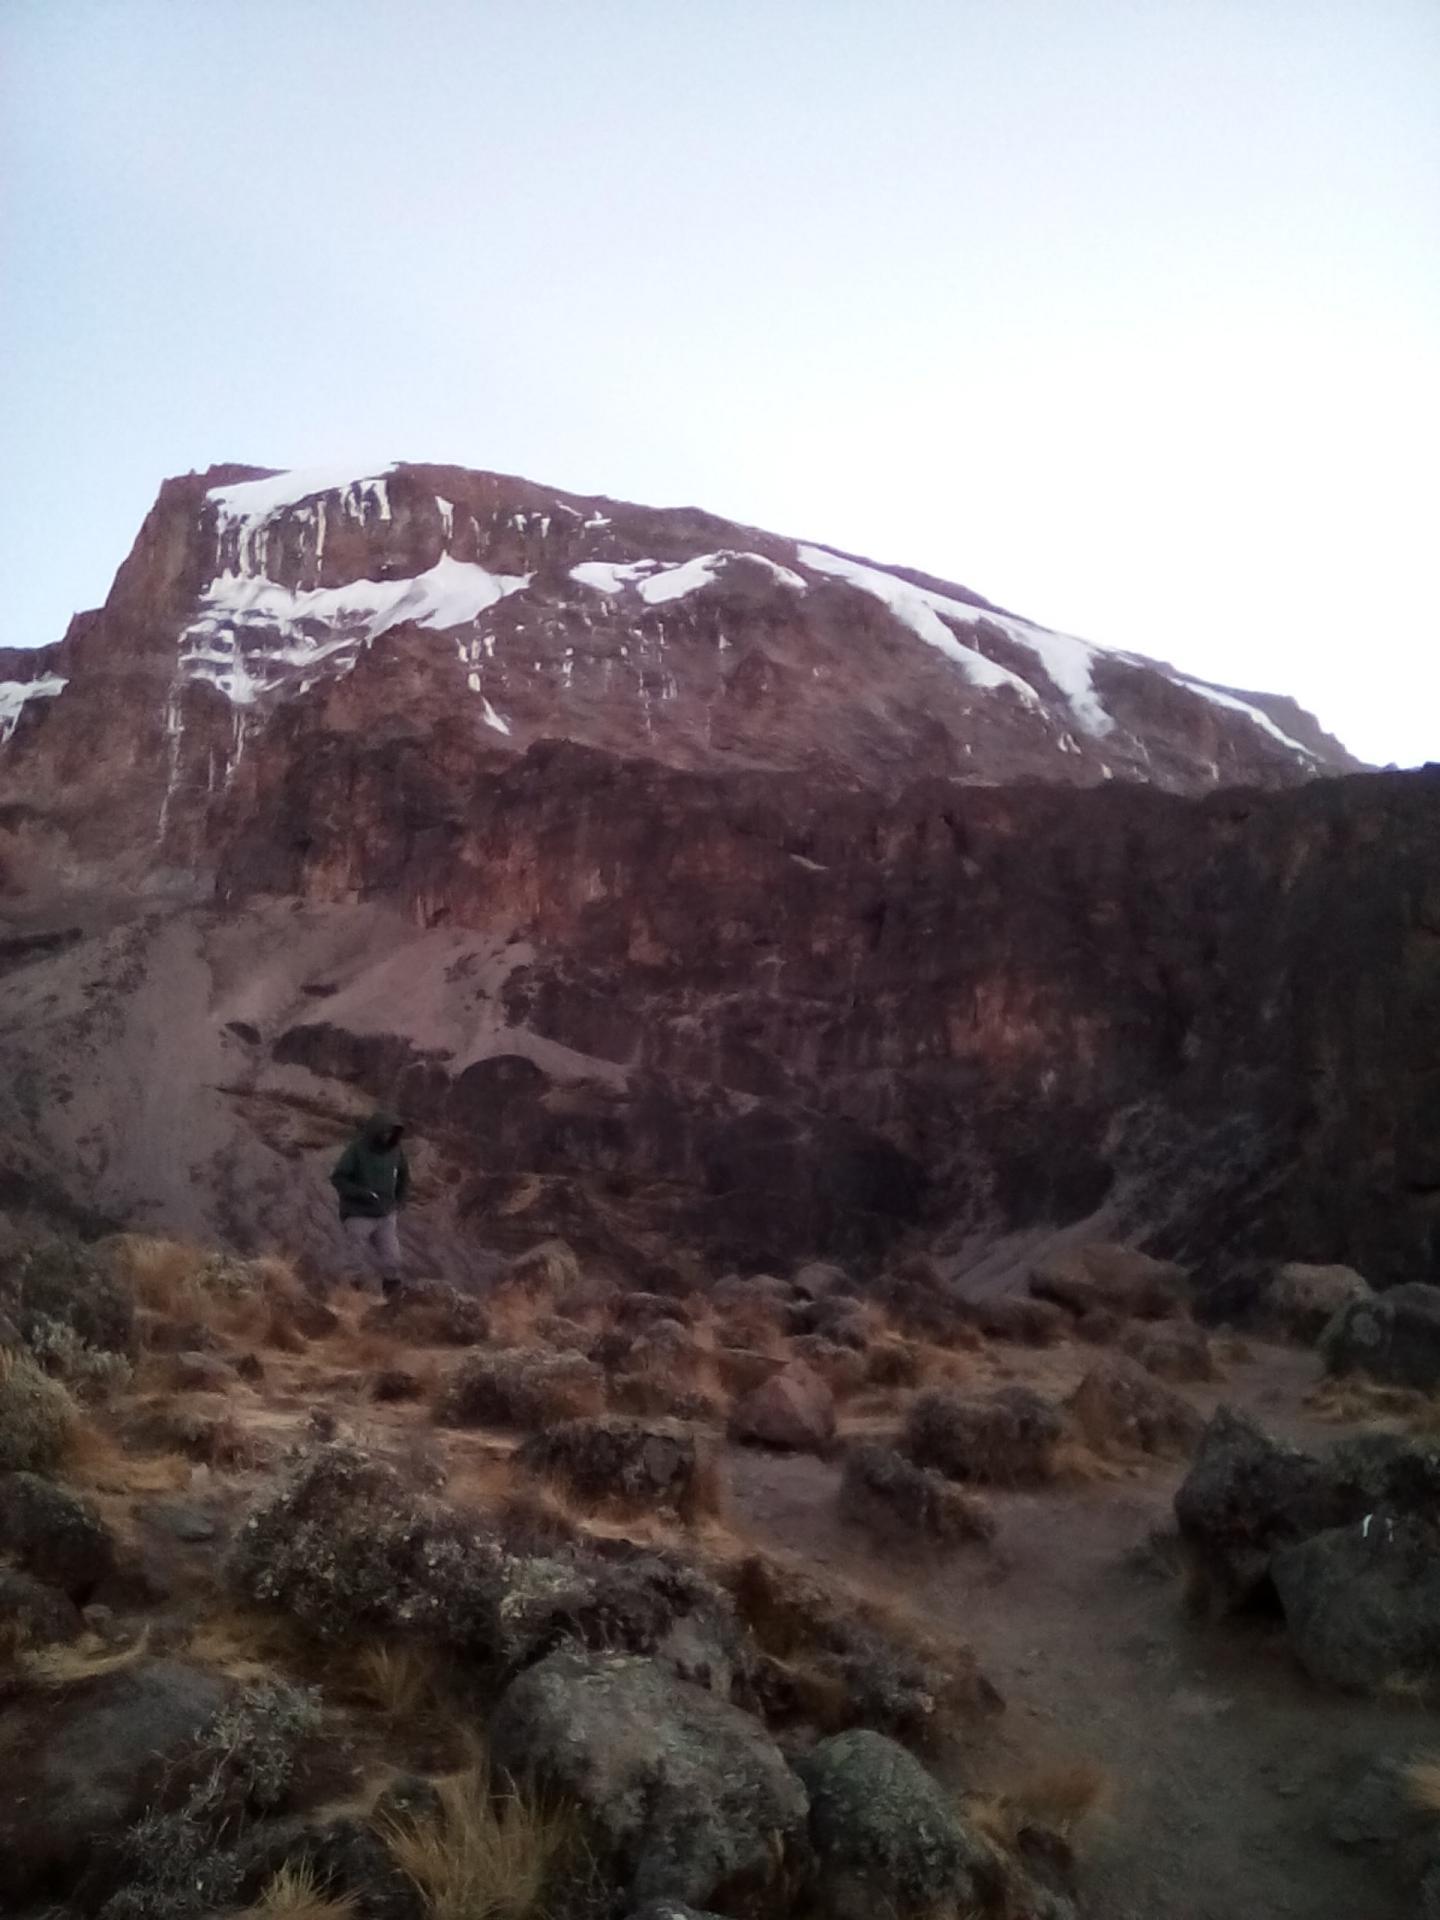 Mount Kilimanjaro  Trekking Safaris-Trekking Mount Kilimanjaro- Mountain Adventures-Climbing Mount Kilimanjaro in Tanzania.